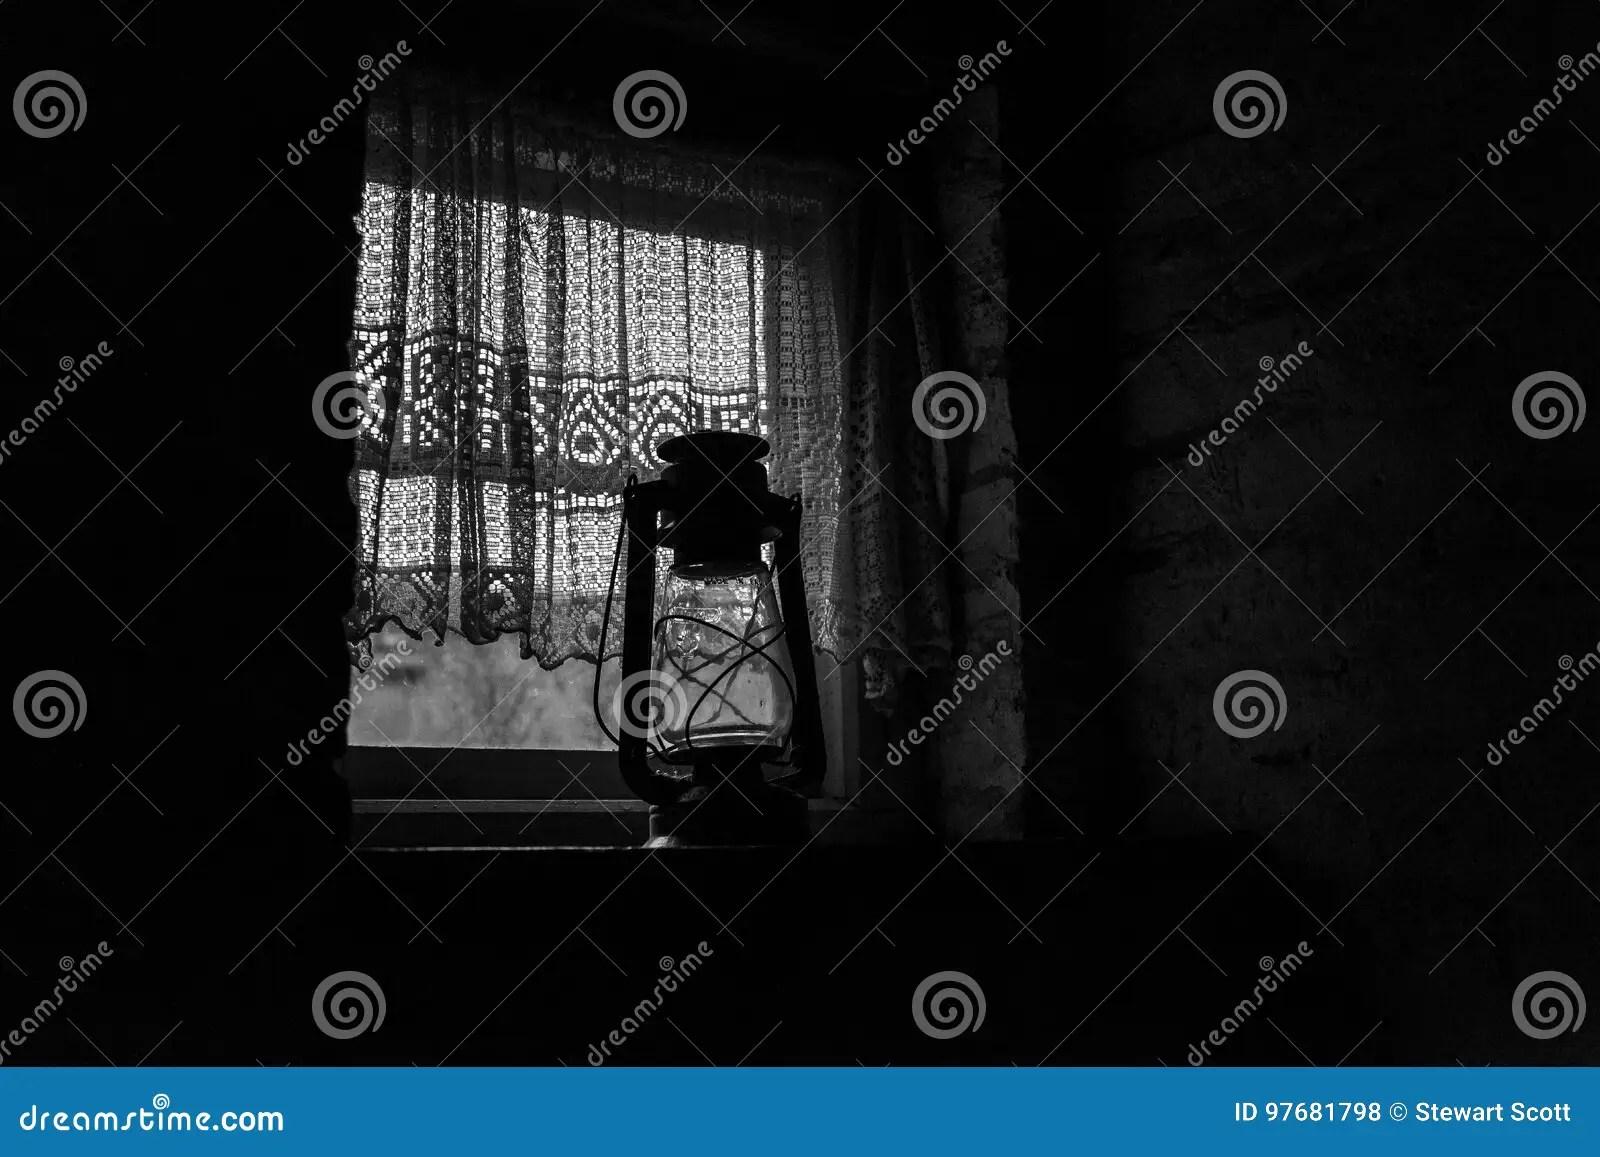 kitchen lanterns black distressed cabinets 一个现出轮廓的19世纪厨房库存照片 图片包括有厨房 需要 灯笼 居民 一个现出轮廓的19世纪厨房